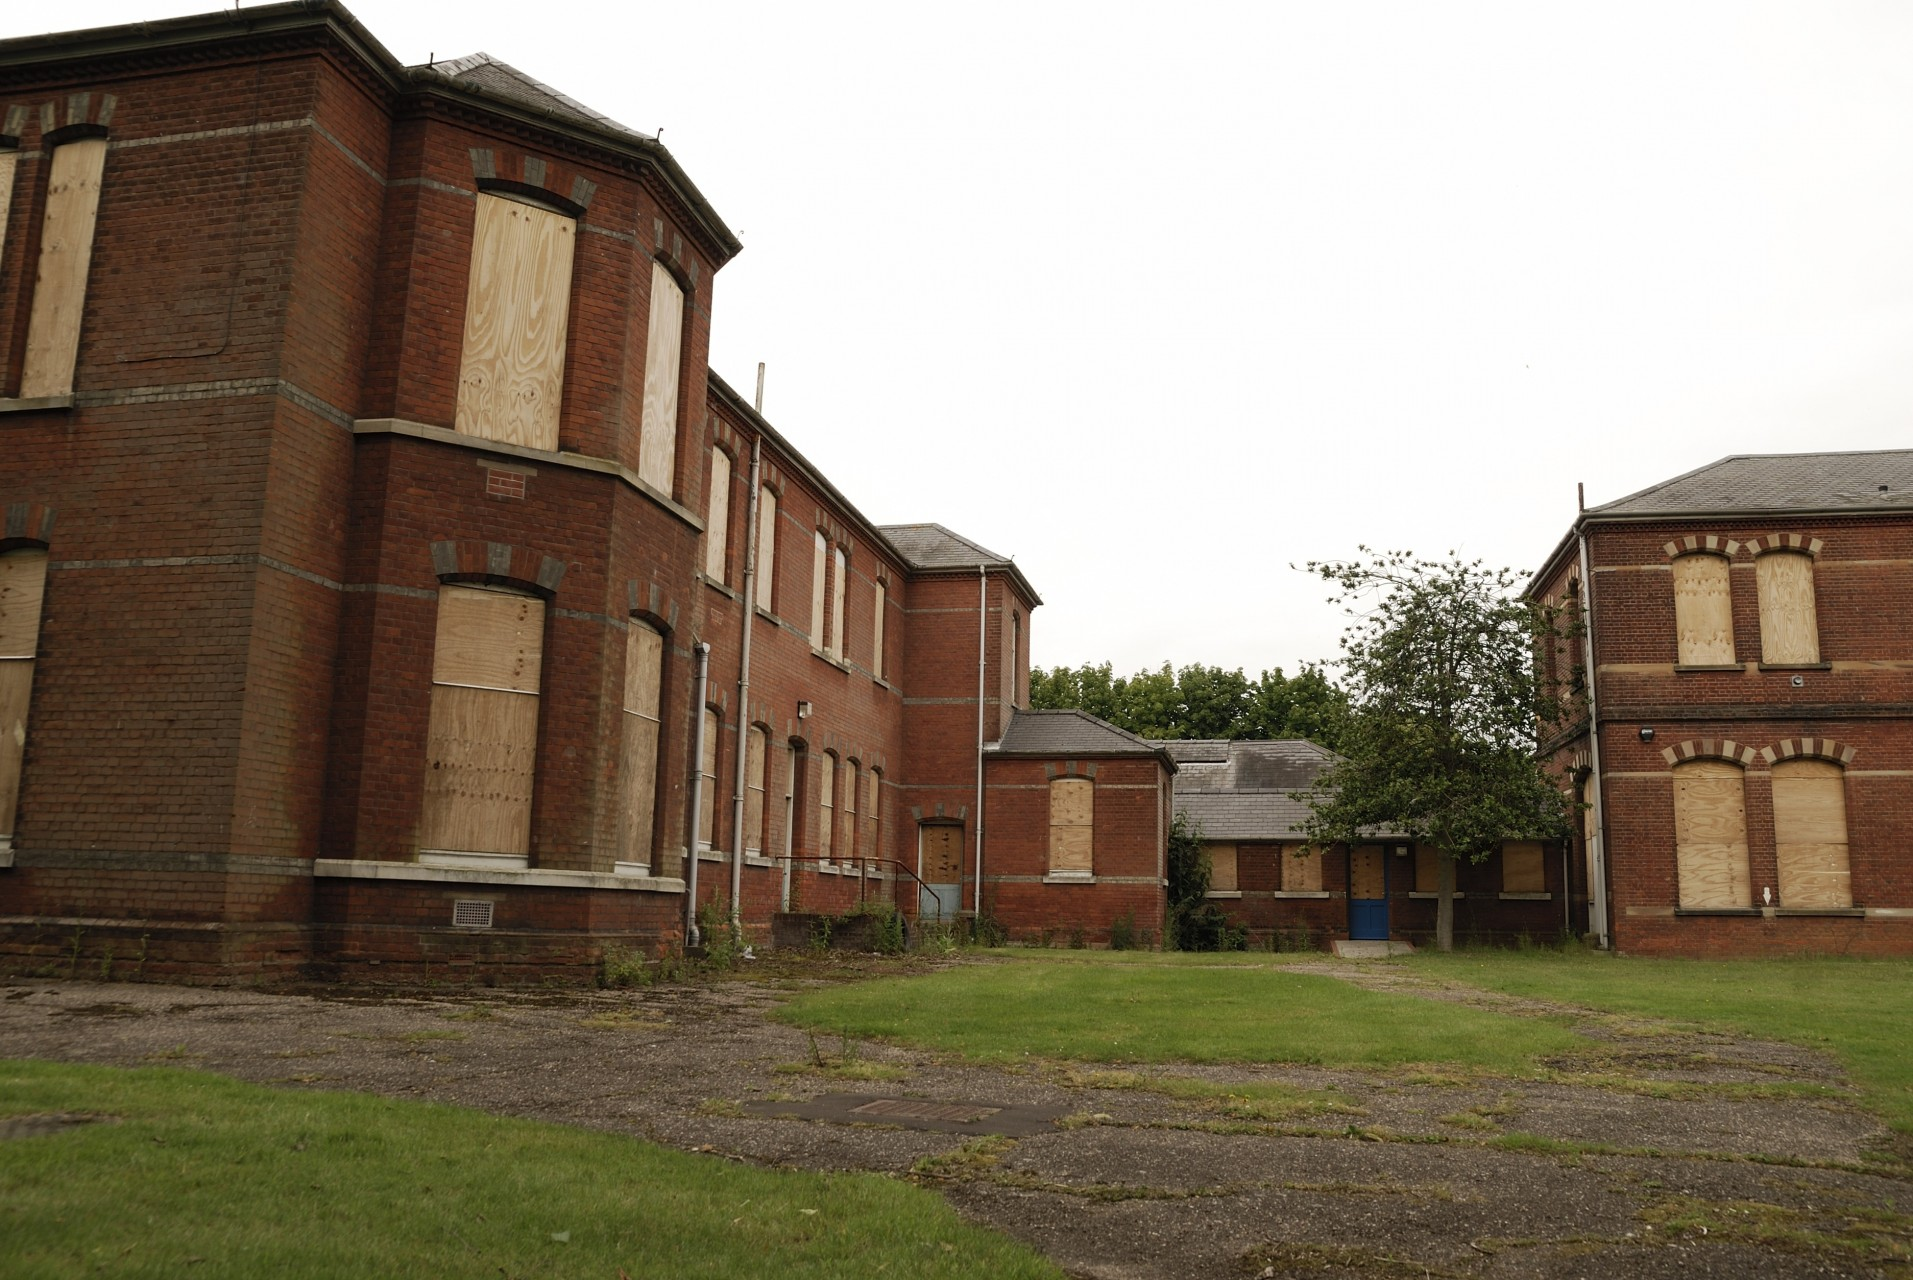 St. Andrews Asylum - Exterior view 2009